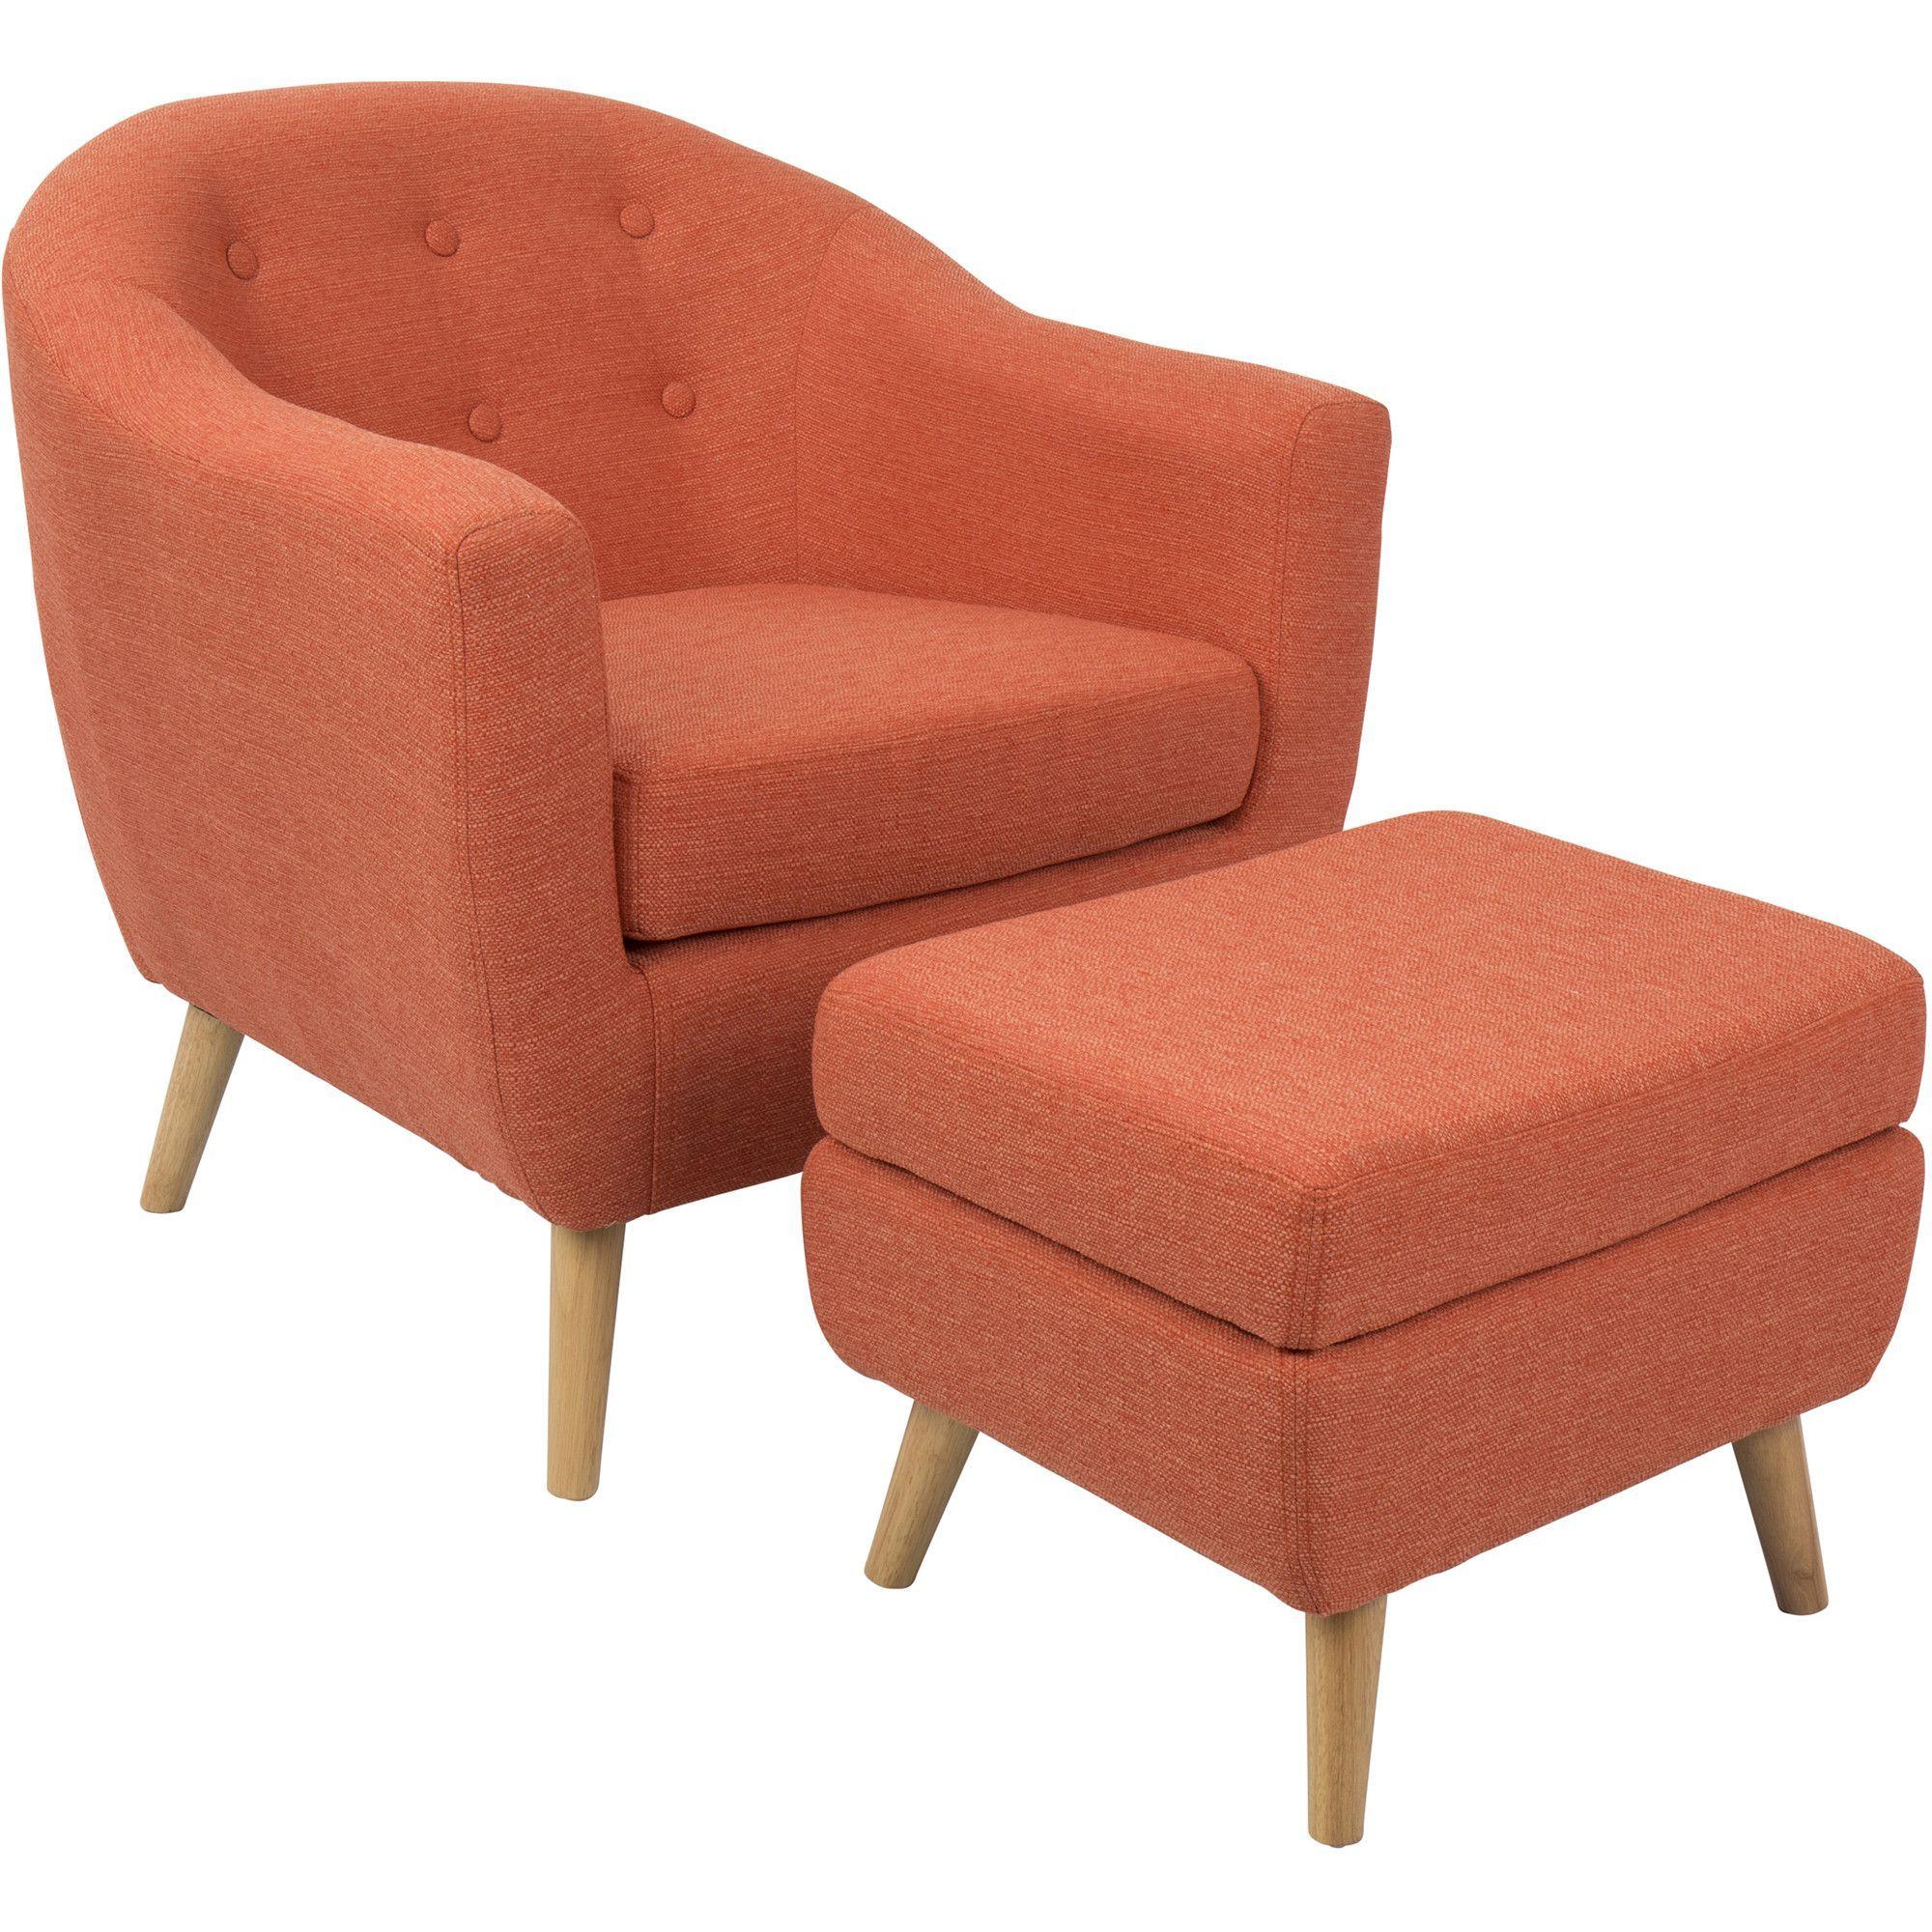 Rockwell Mid Century Modern Chair With Ottoman, Orange